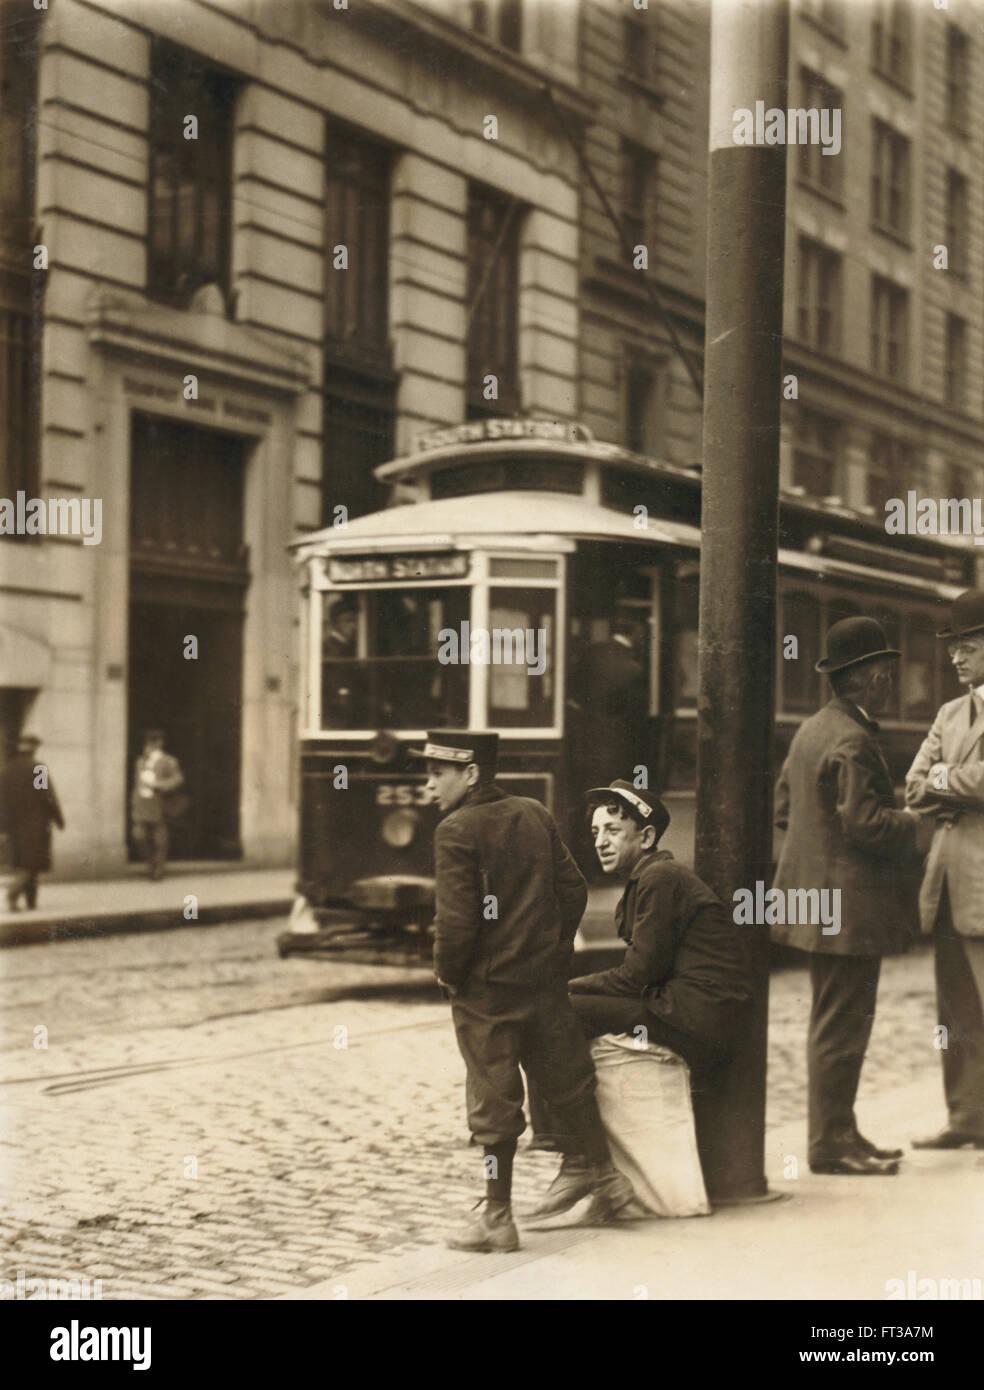 Two Messenger Boys Waiting on Street, Boston, Massachusetts, USA, circa 1910 - Stock Image